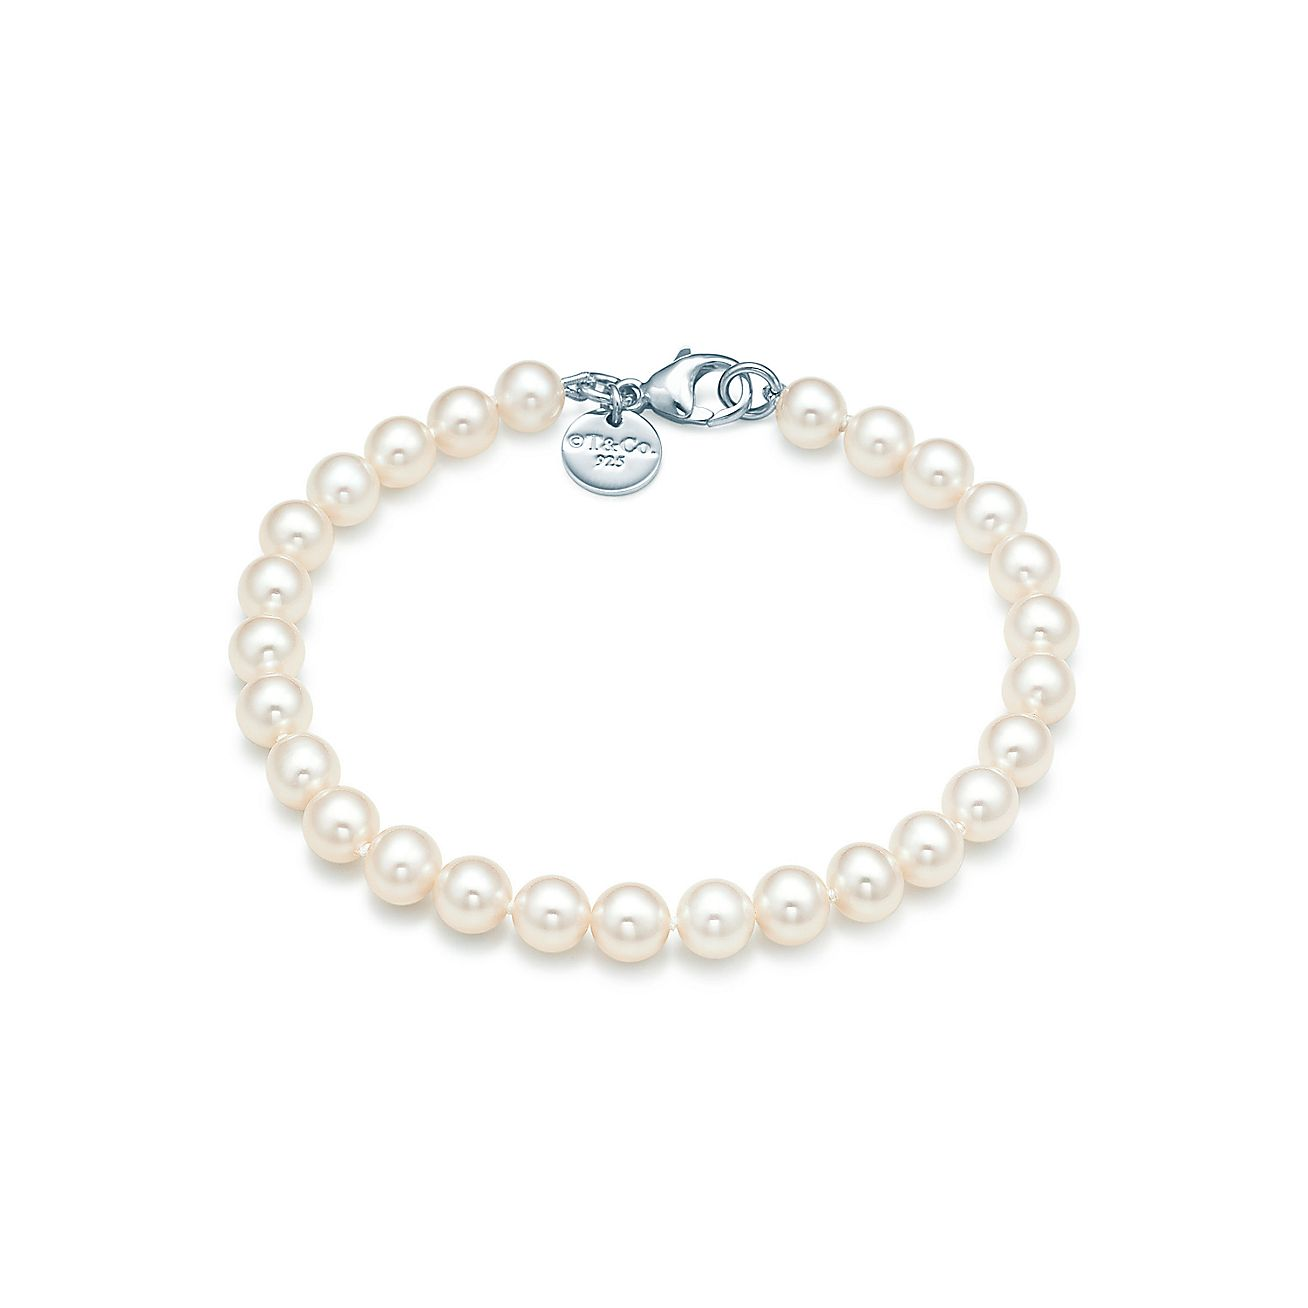 Perlenarmband  Perlenarmband mit Sterlingsilberverschluss. | Tiffany & Co.